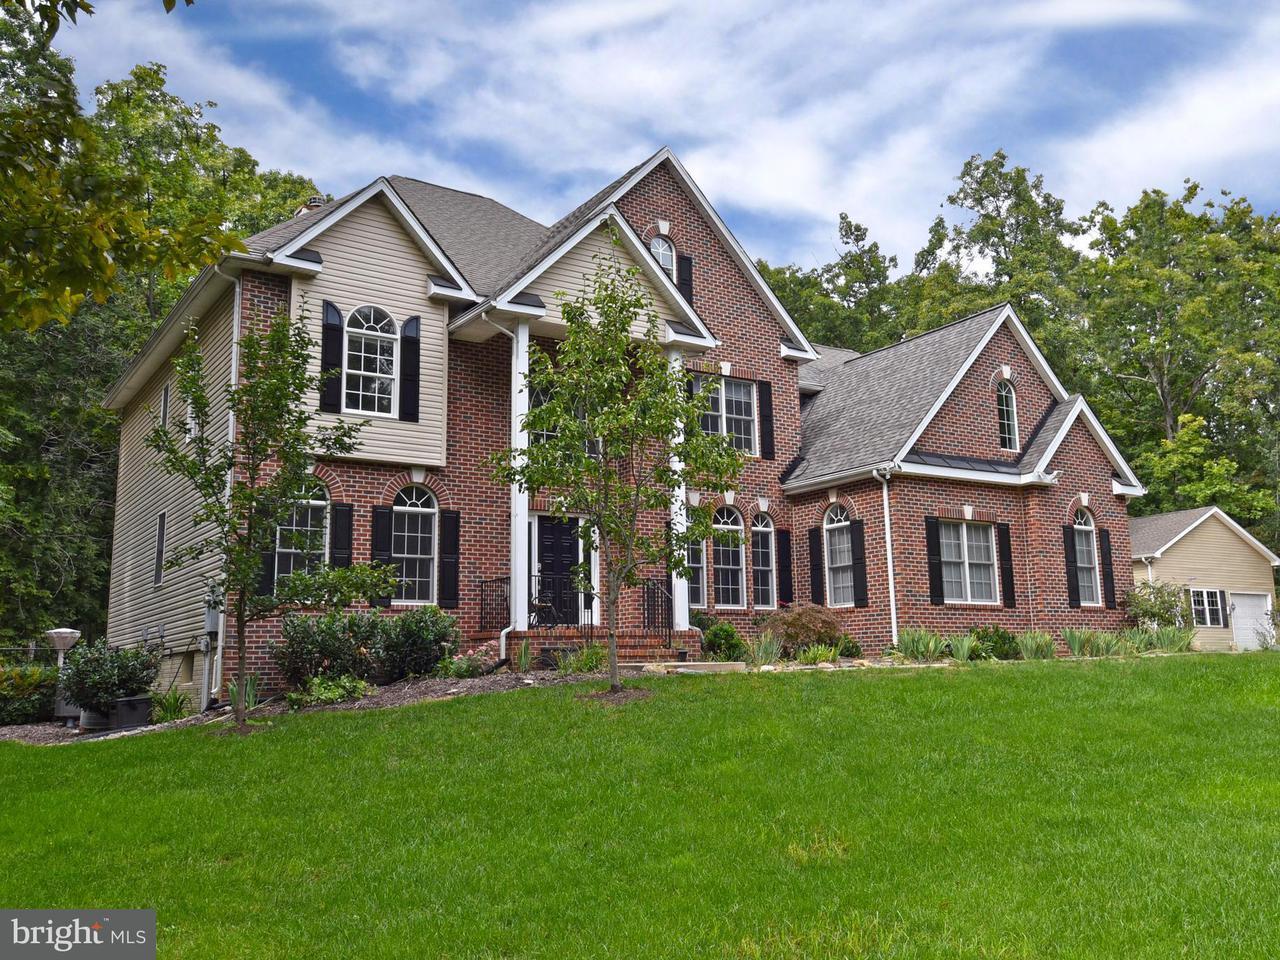 Casa Unifamiliar por un Venta en 13012 THORNTON Drive 13012 THORNTON Drive Catharpin, Virginia 20143 Estados Unidos